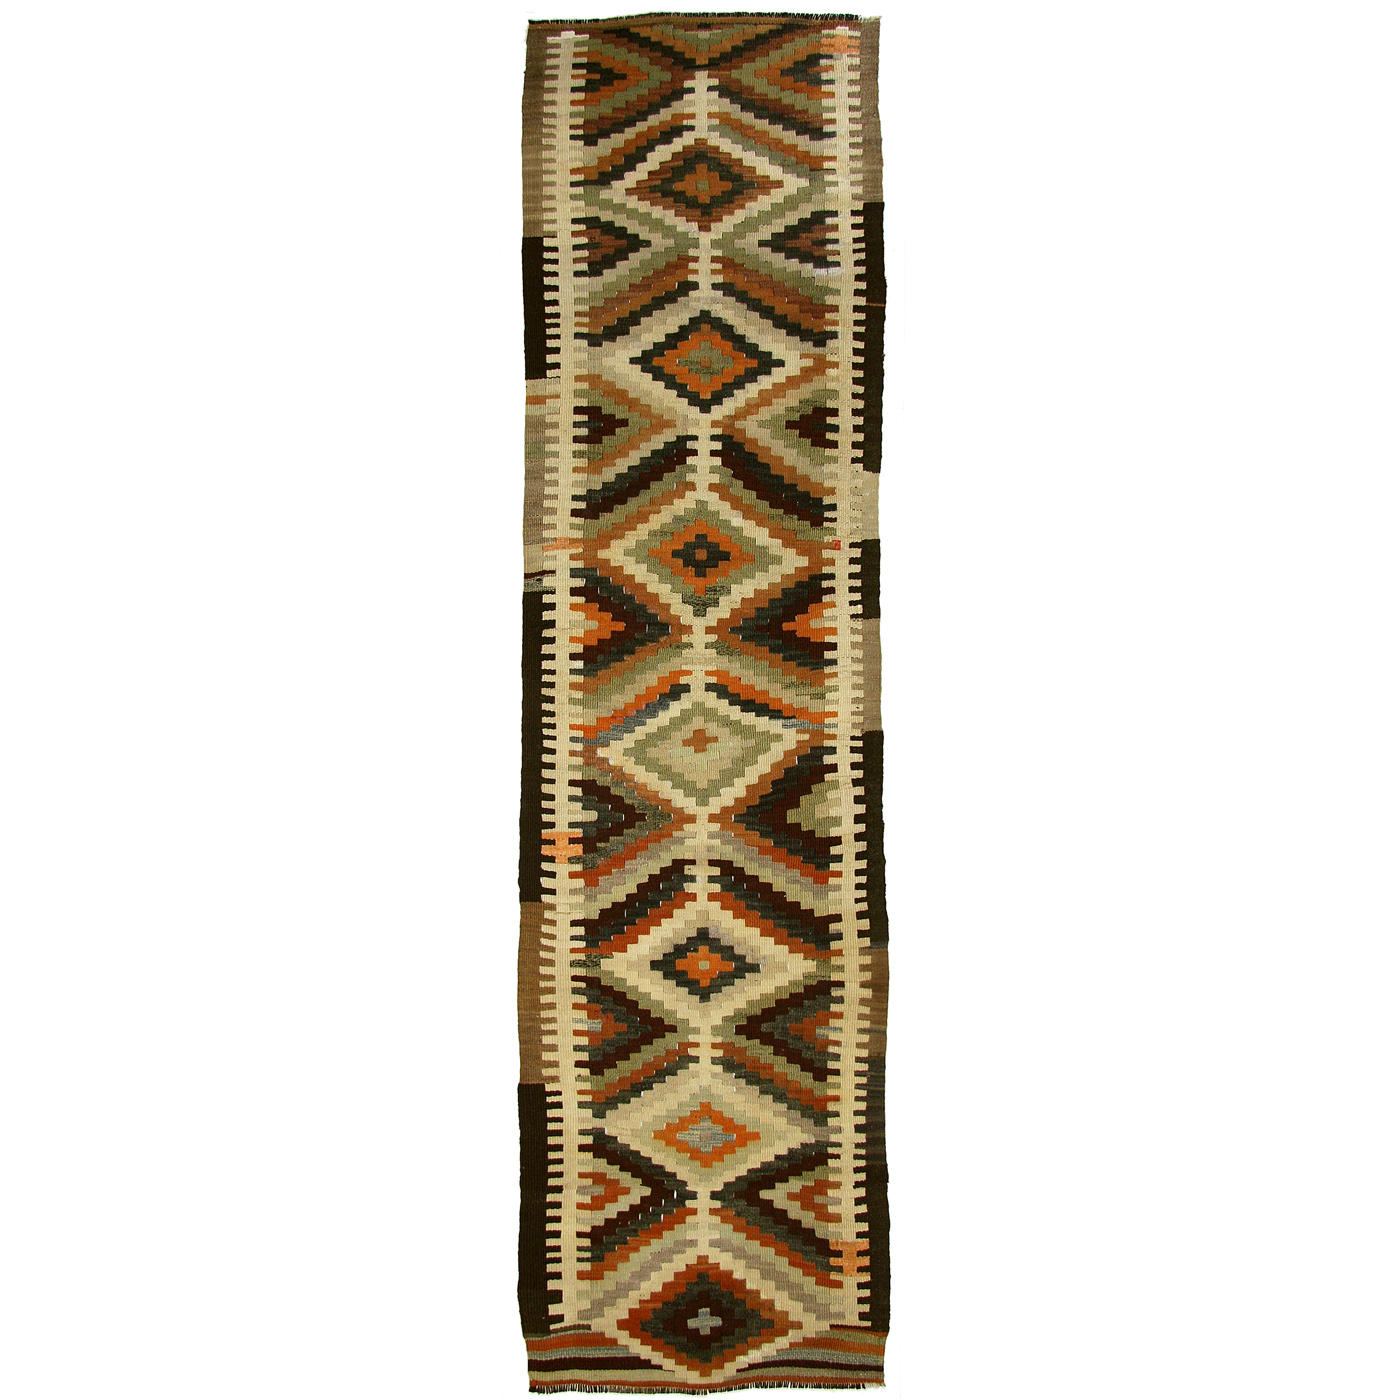 Striking earth tone vintage kilim 2 39 11 x 12 39 1 chairish for Sofa global 6450